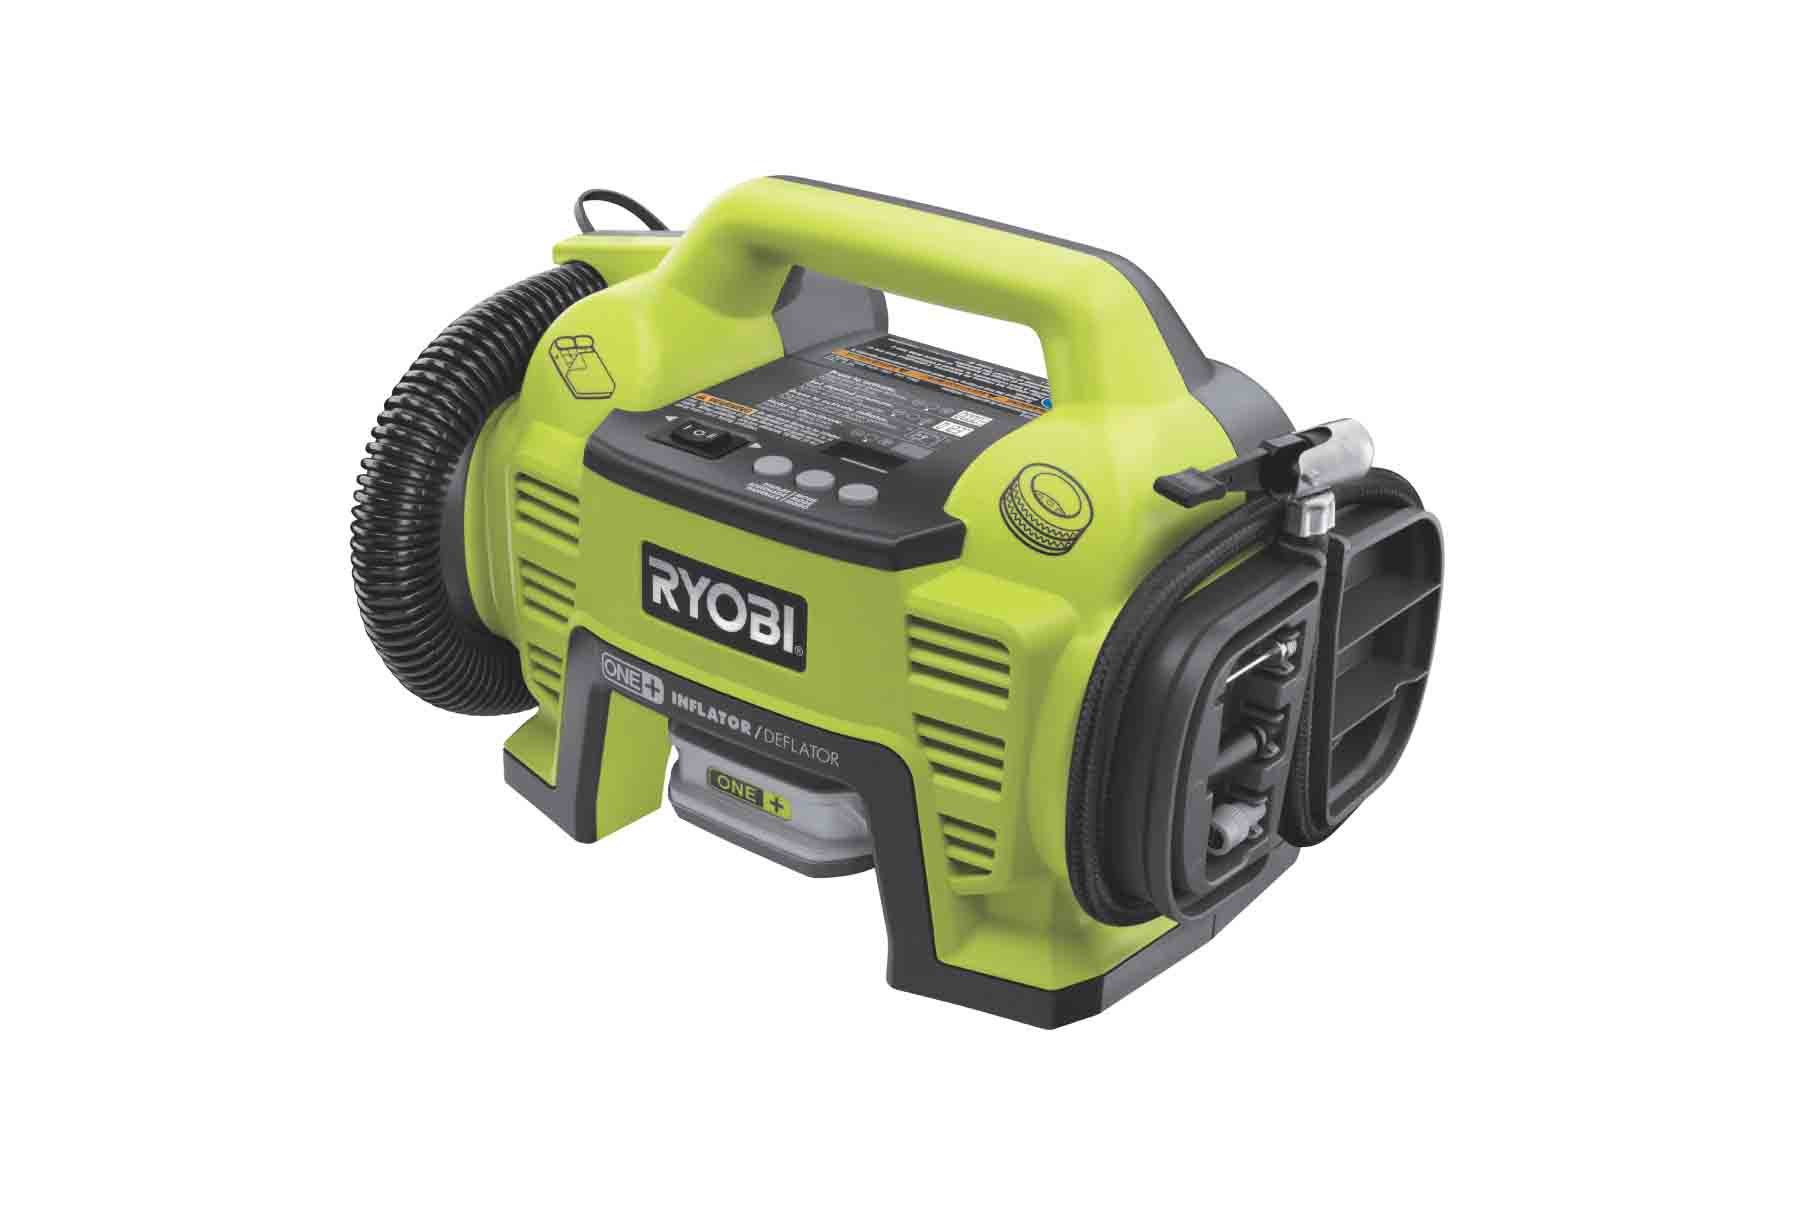 ryobi: kompressor mit akku - camping, cars & caravans